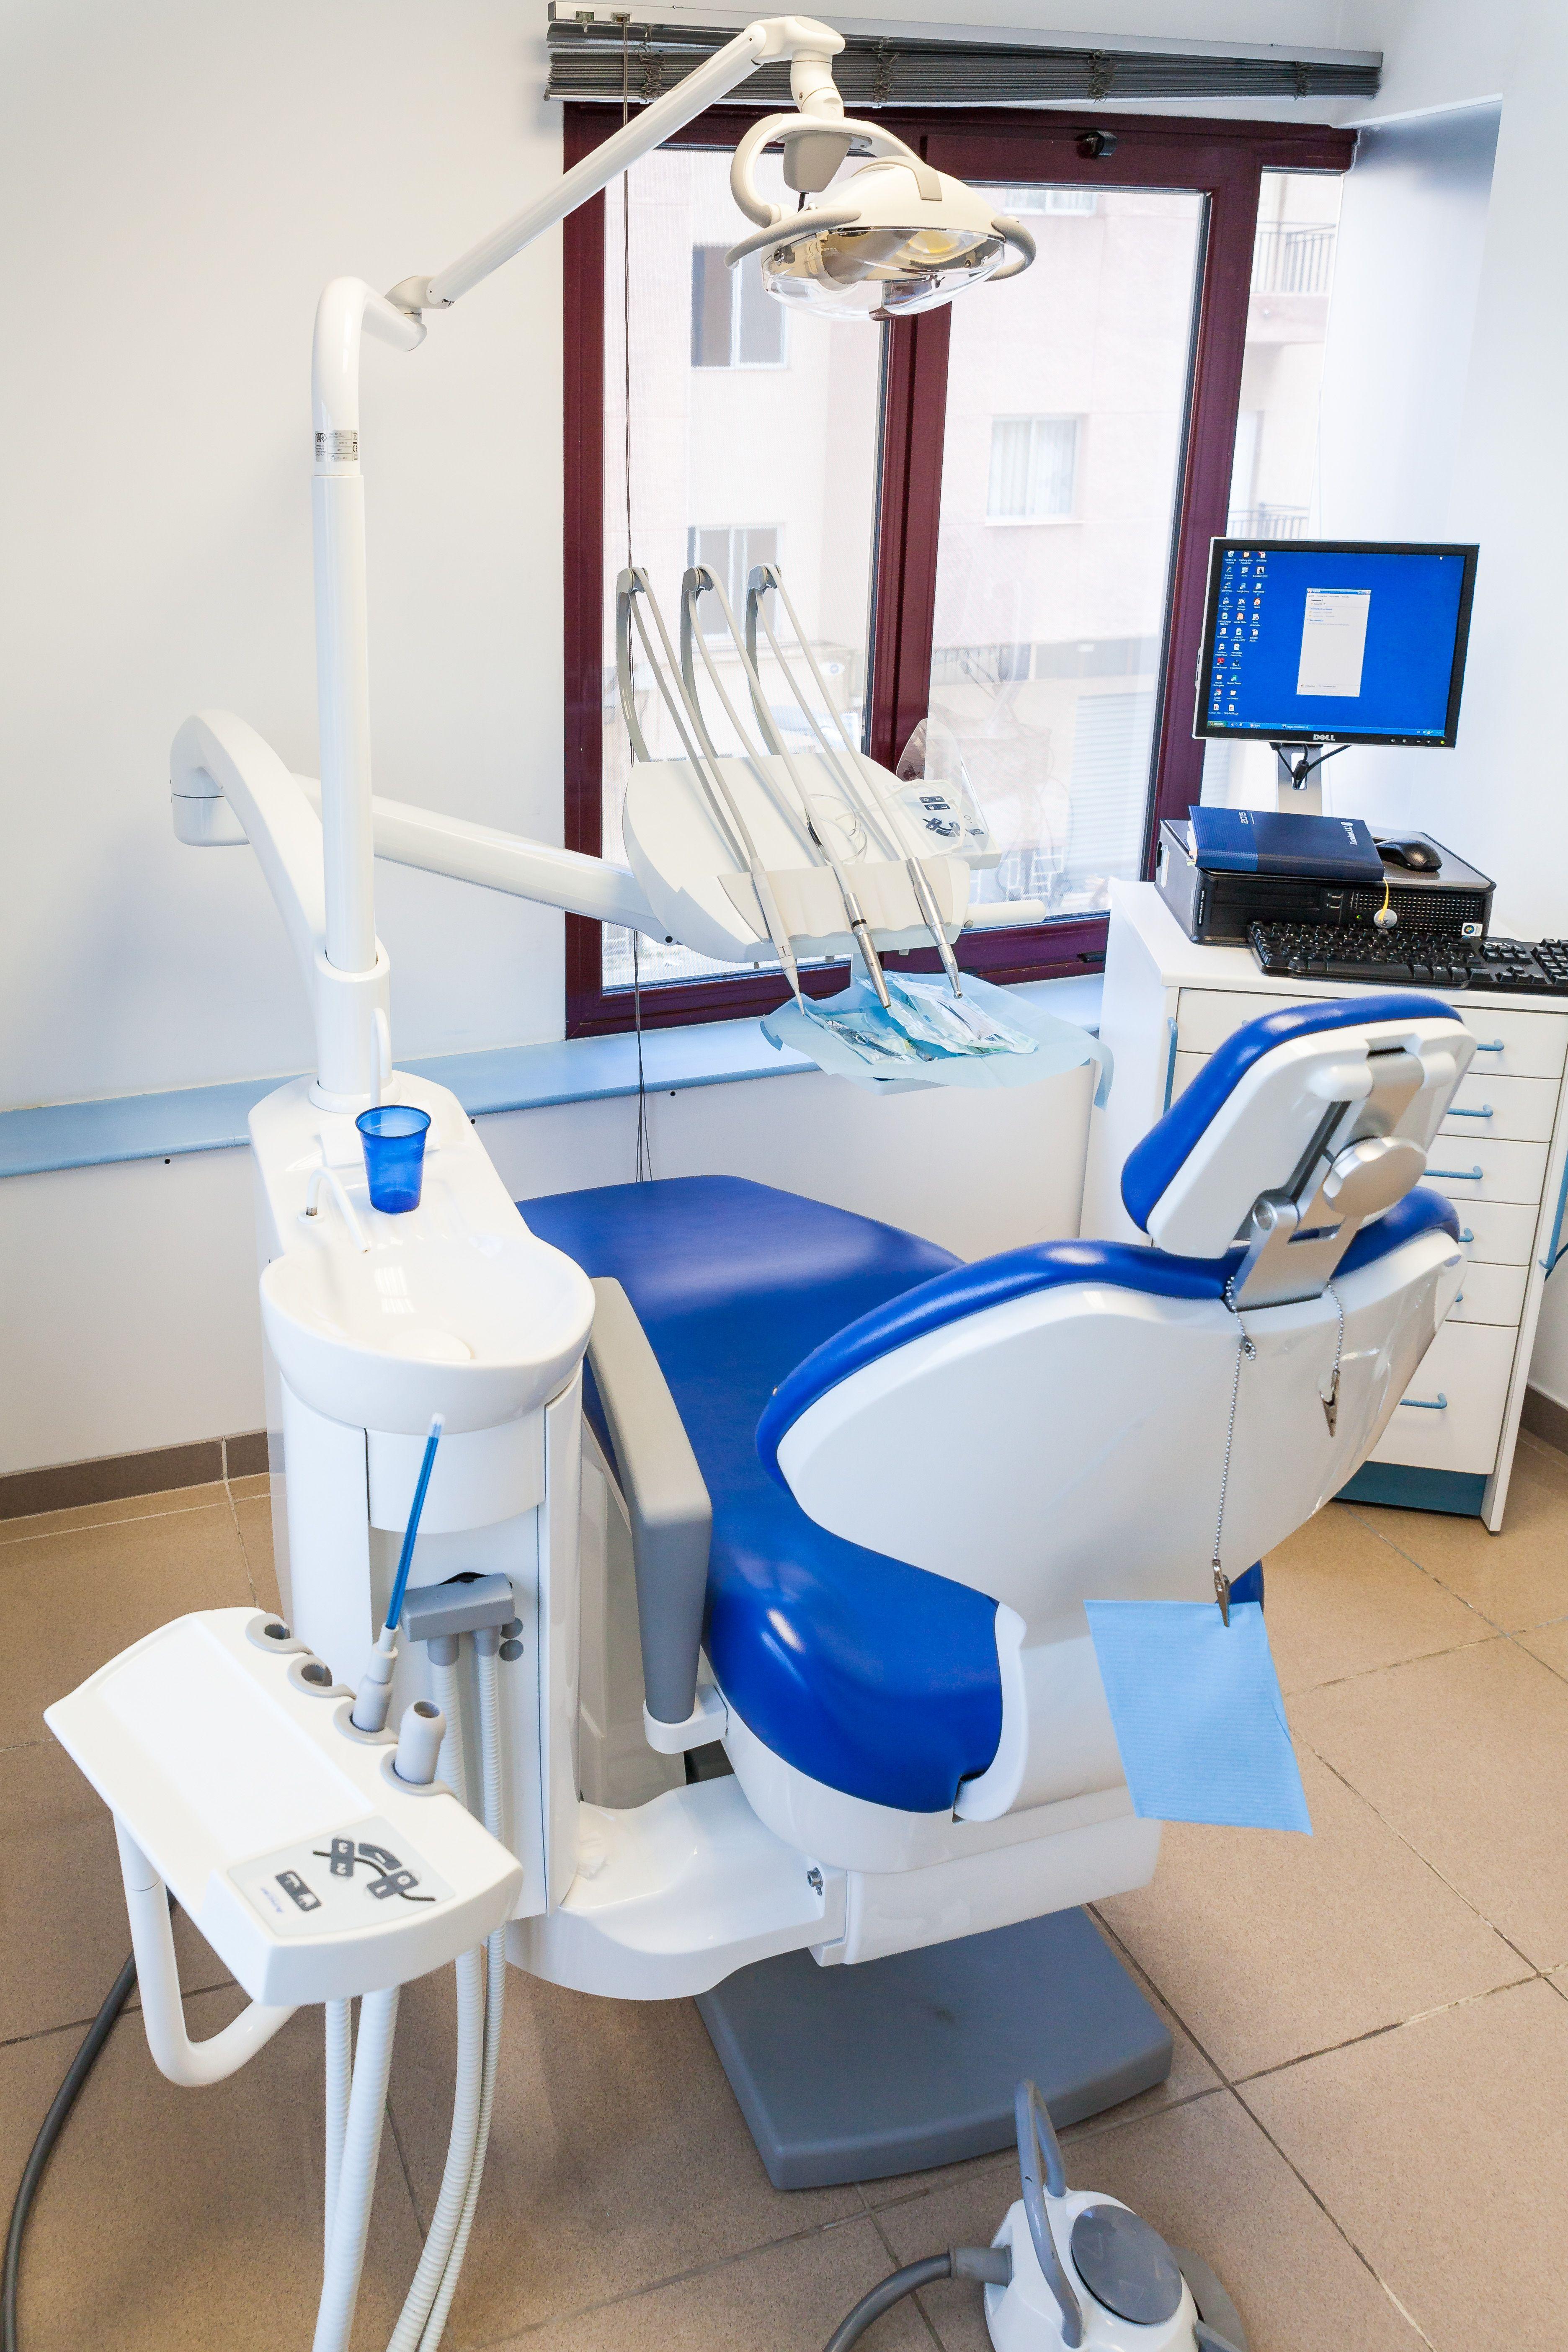 Foto 5 de Clínica dental en La Laguna   Dential